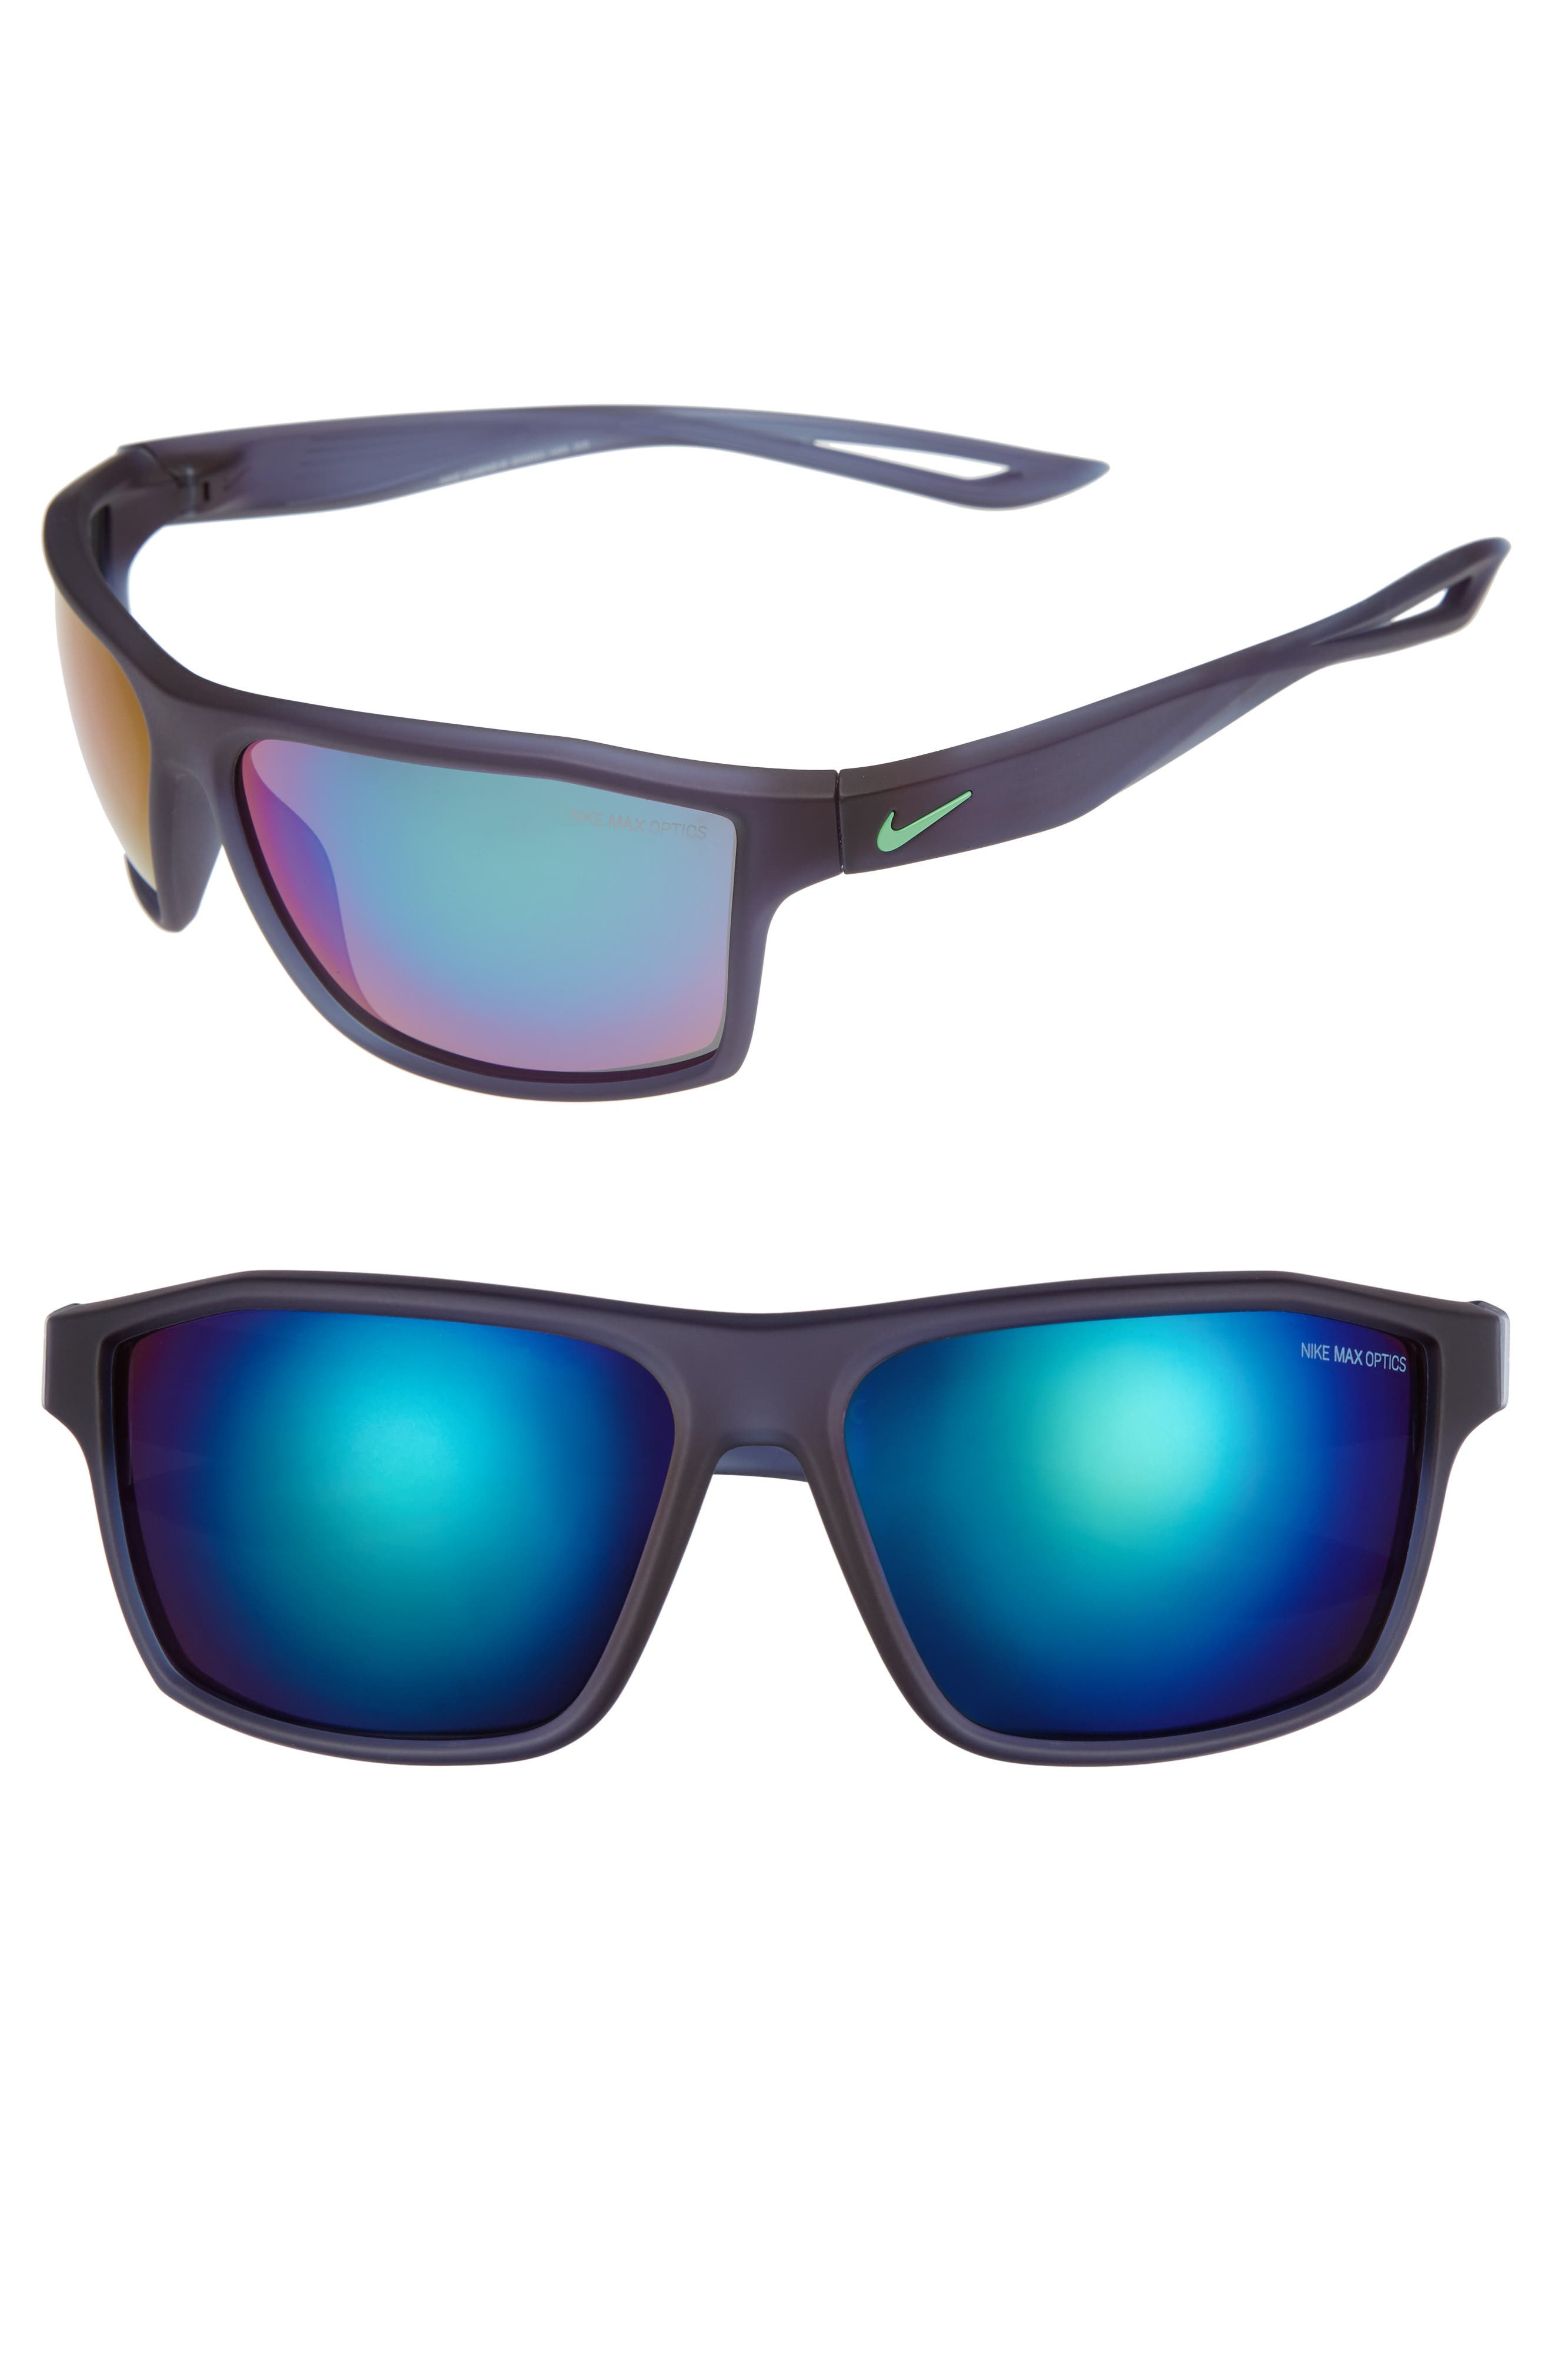 Legend 65mm Mirrored Multi-Sport Sunglasses,                             Main thumbnail 1, color,                             MATTE MIDNIGHT NAVY